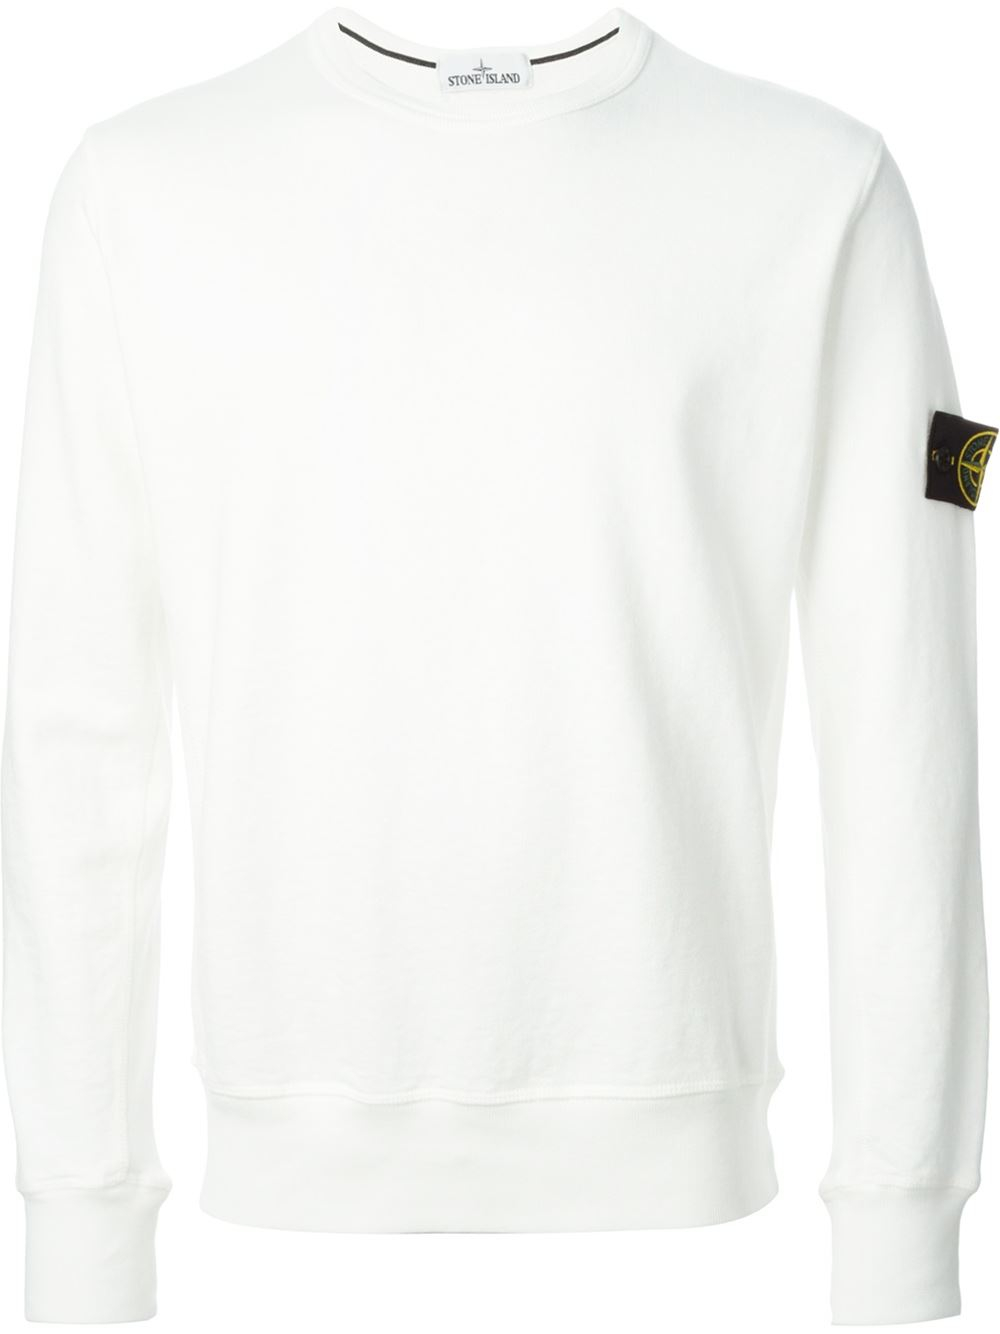 Lyst Stone Island Crew Neck Sweatshirt In White For Men